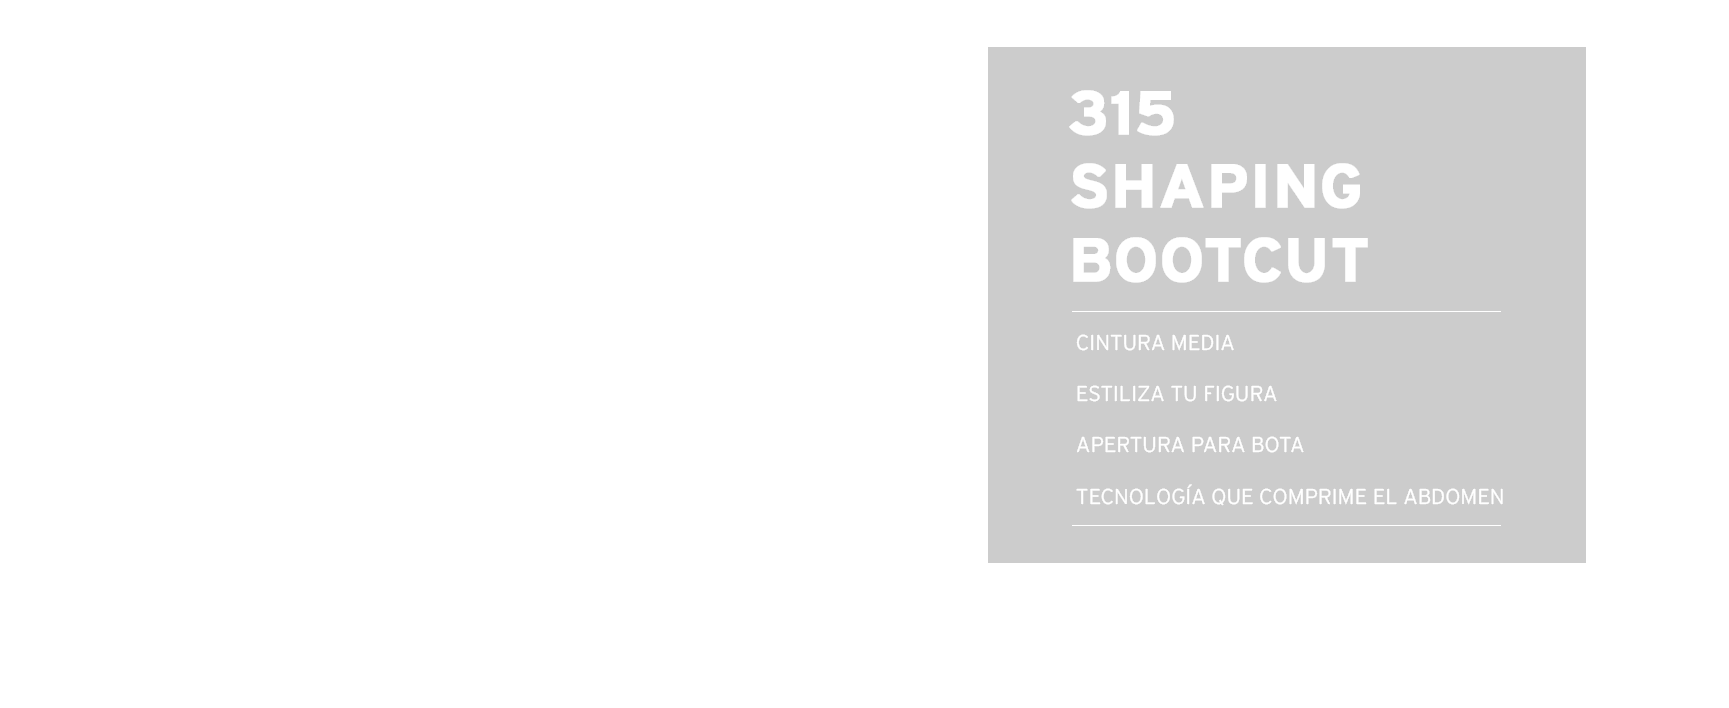 315 shaping bootcut